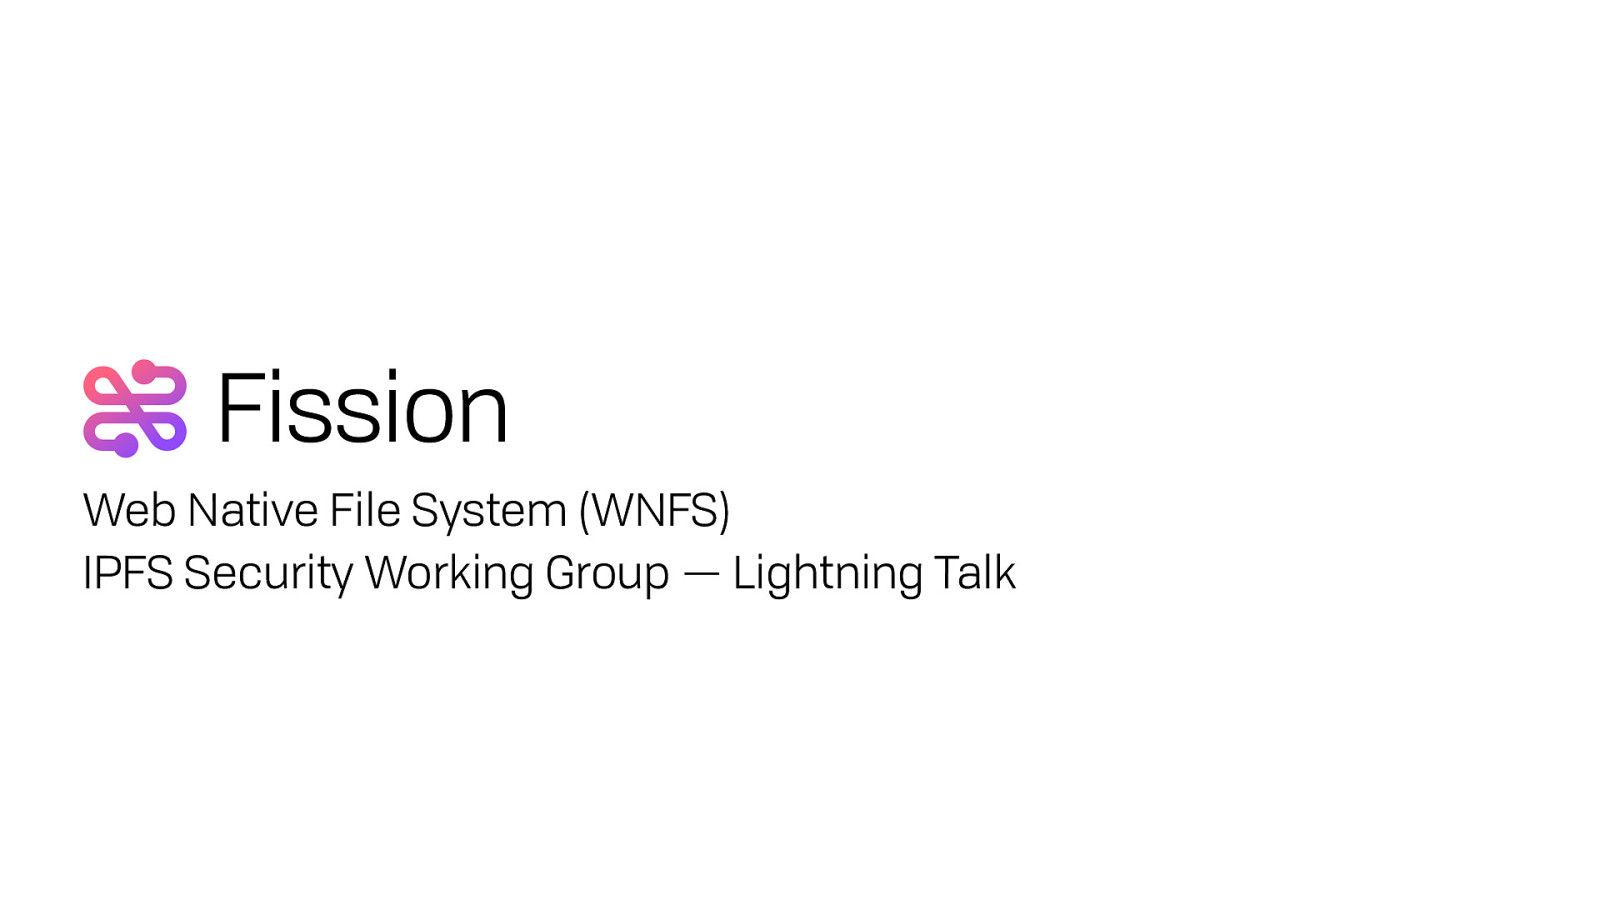 IPFS Security WG —WNFS Prior Art